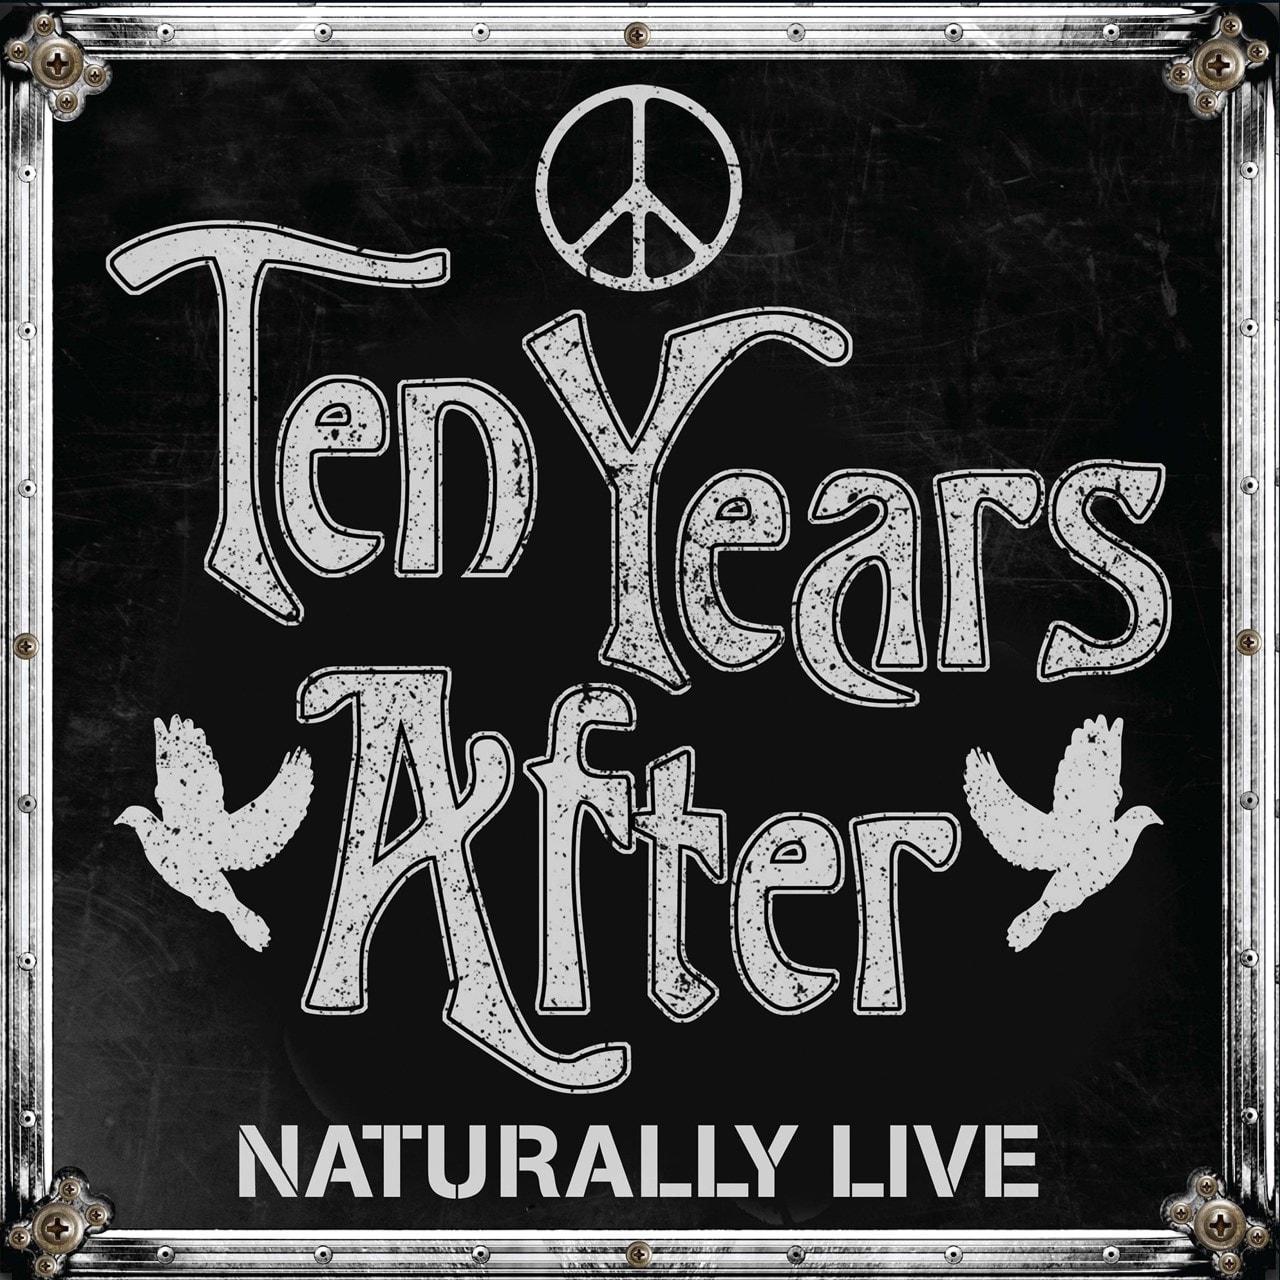 Naturally Live - 1